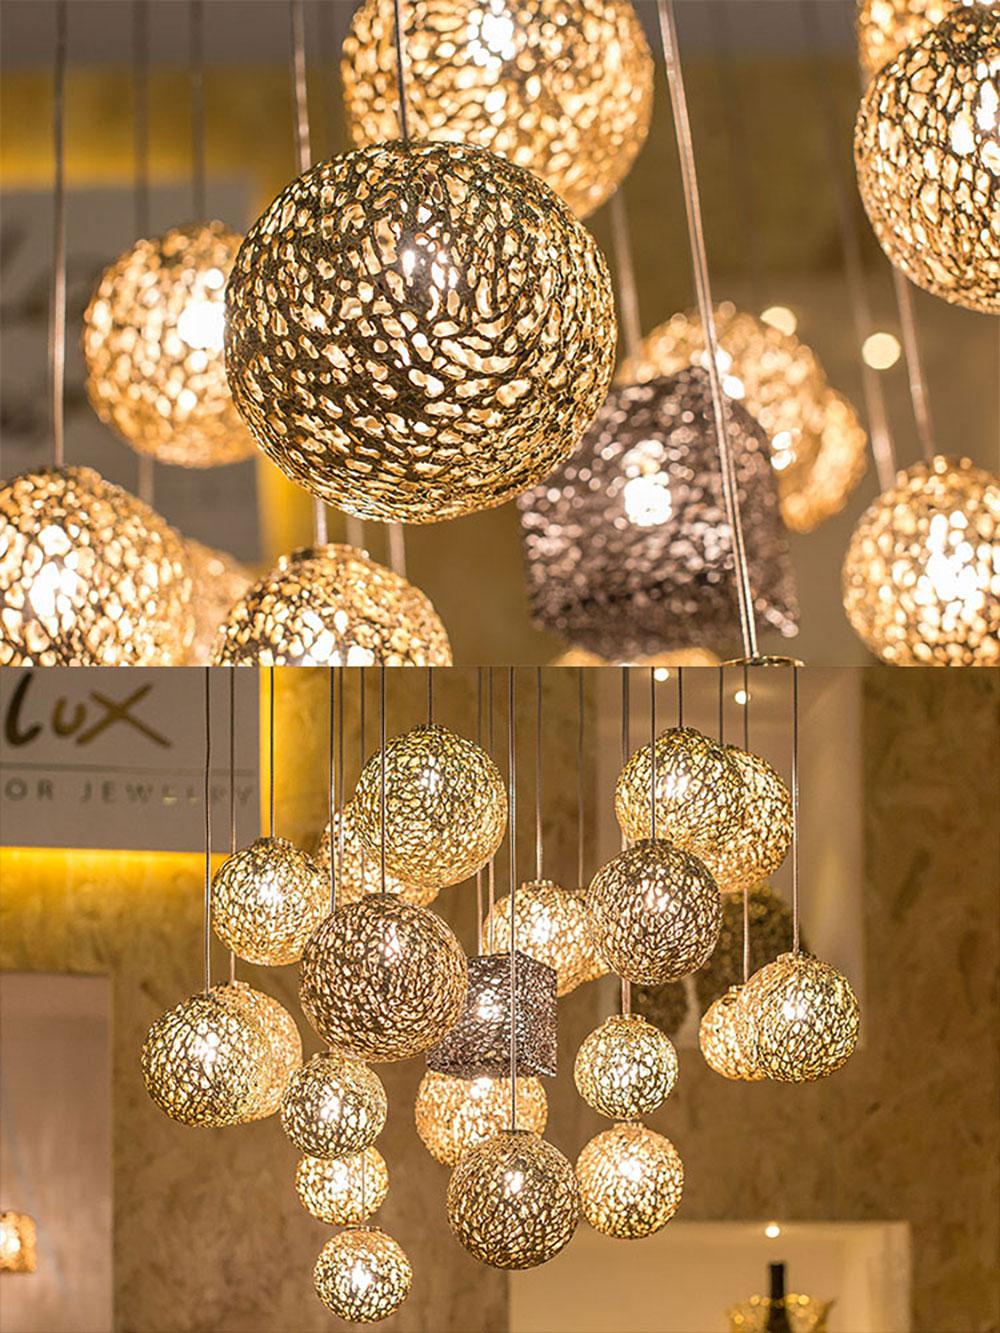 Luminaire en bronze fini or 24 carats par Alessandro Galanti pour Al Gala Lux Interior Jewelry